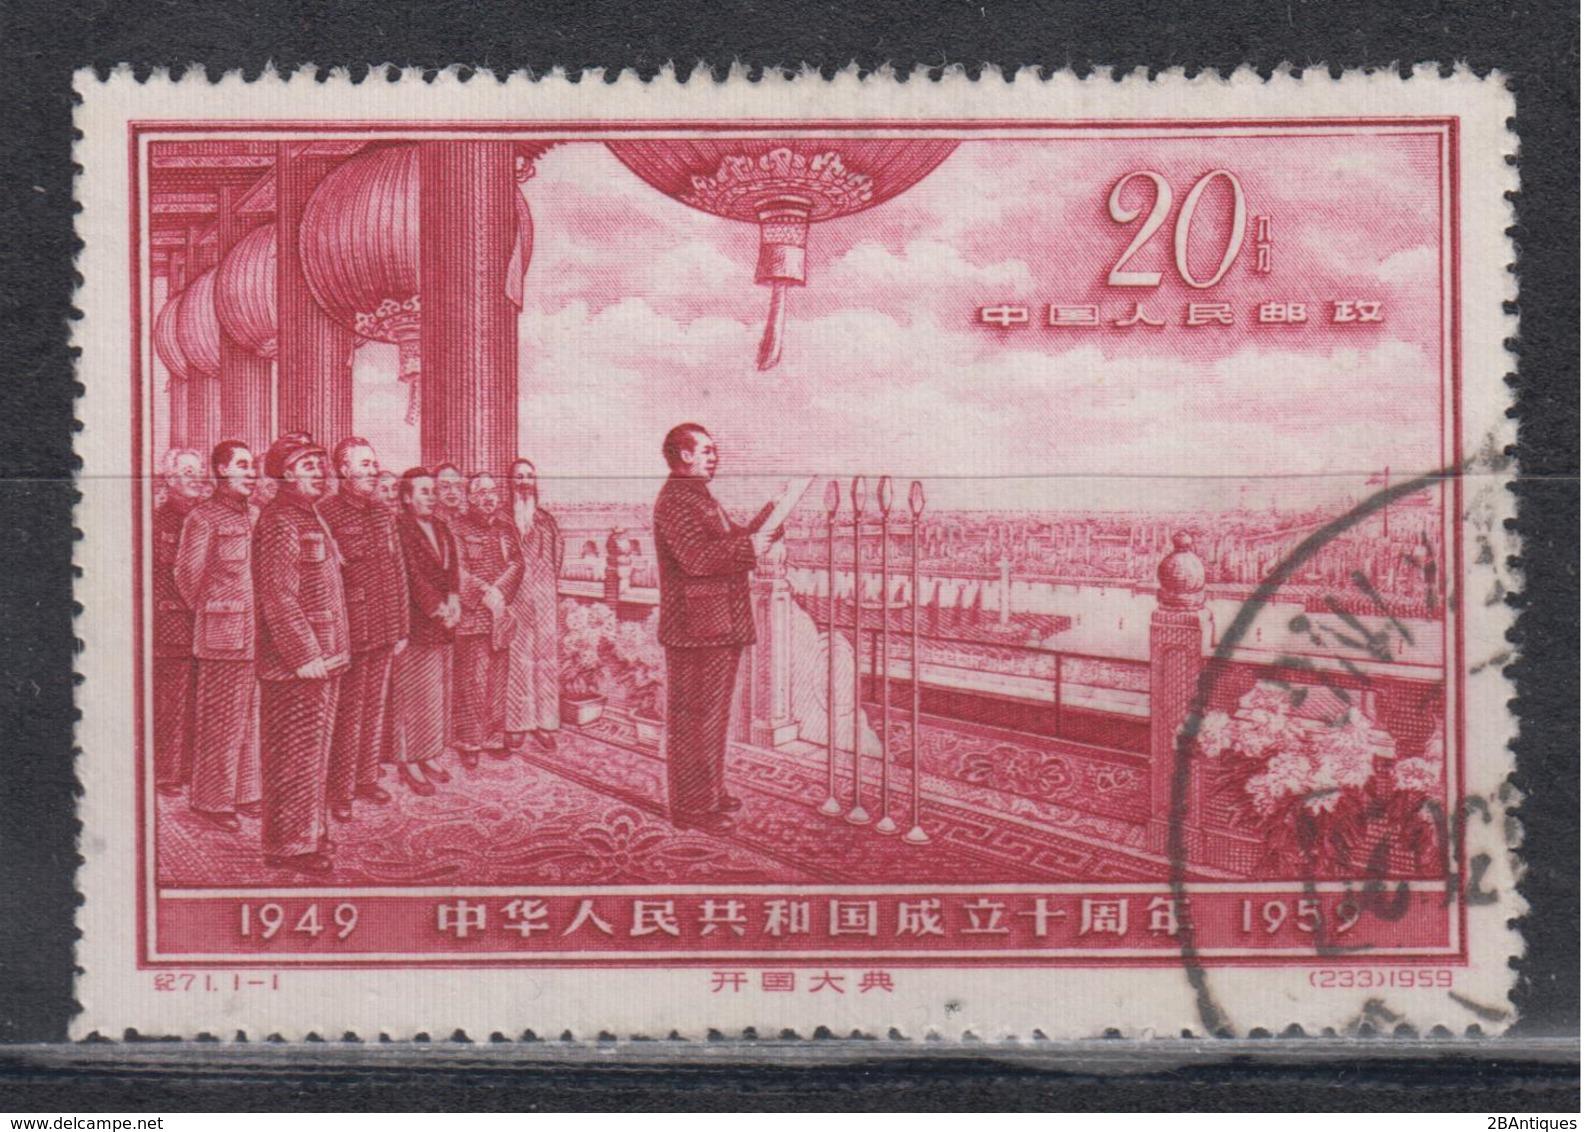 PR CHINA 1959 - The 10th Anniversary Of People's Republic - 1949 - ... Volksrepublik